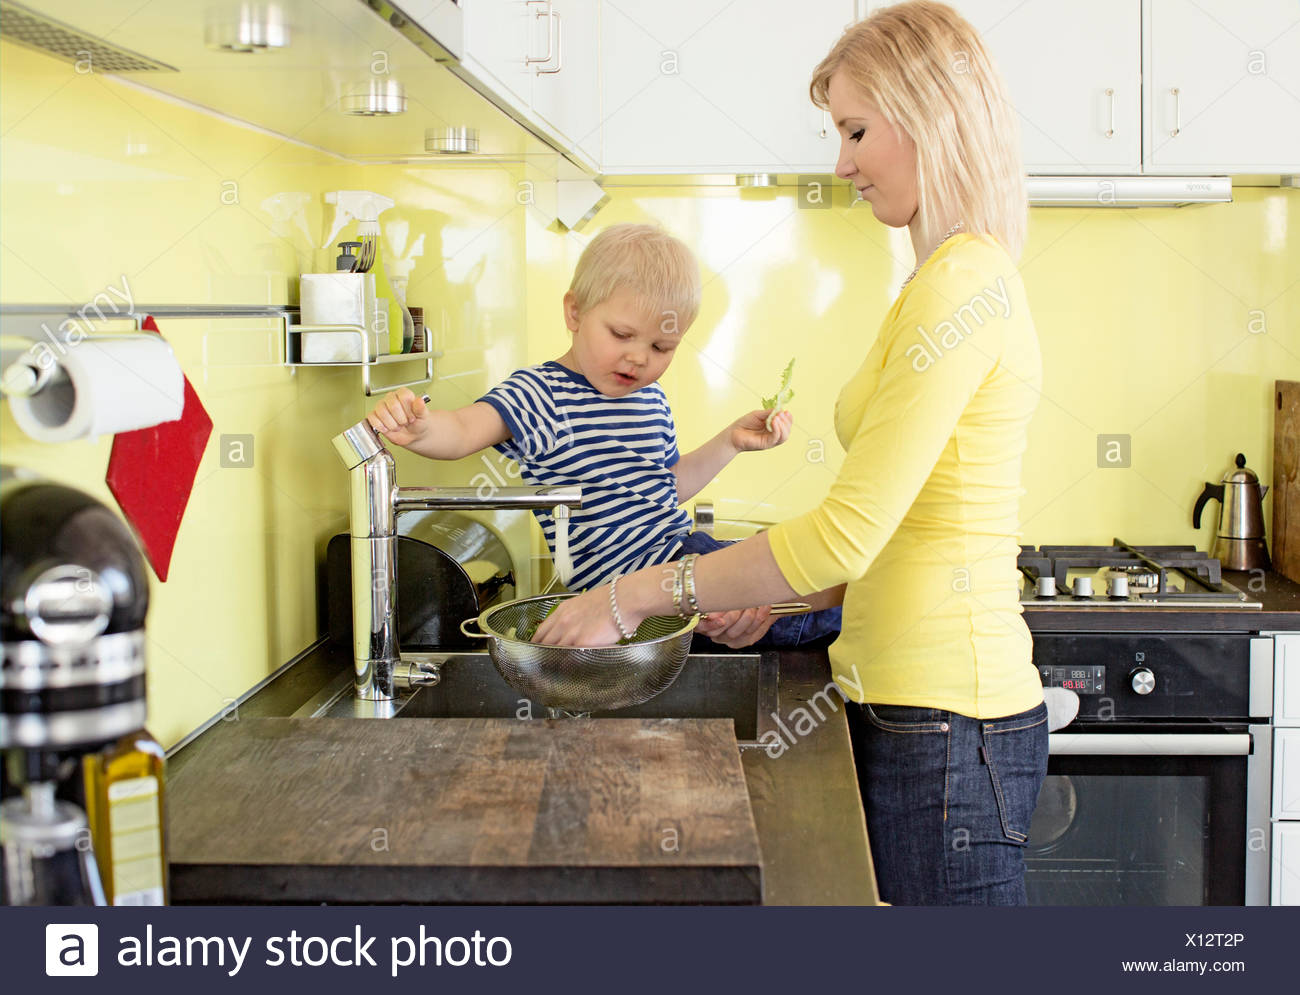 Finland, Helsinki, Kallio, Mother and son in kitchen rinsing vegetables in colander - Stock Image